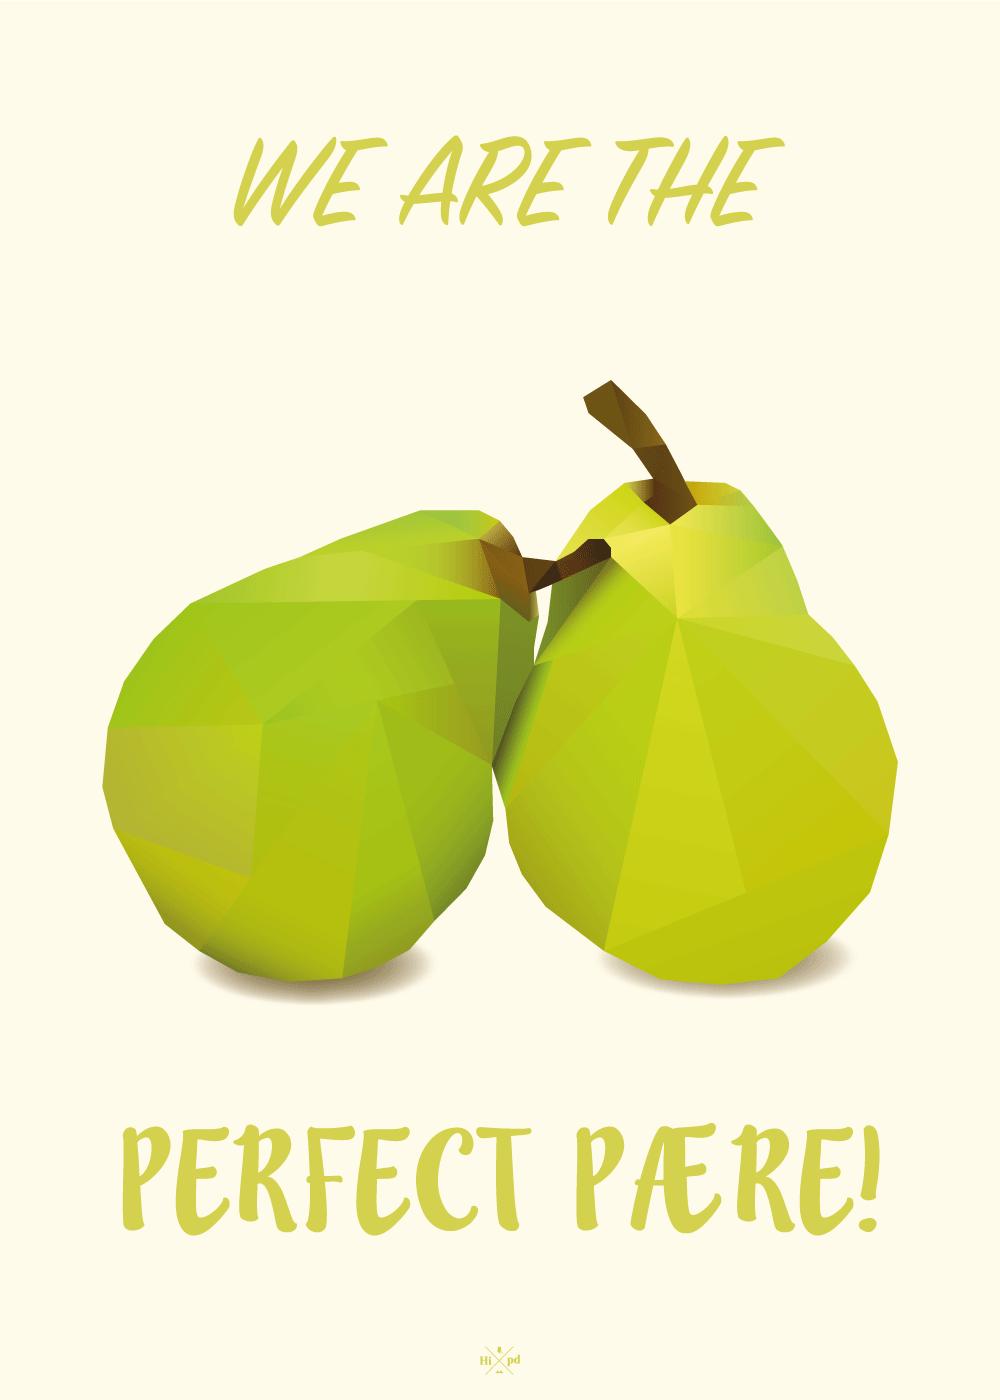 The perfect pære - plakat